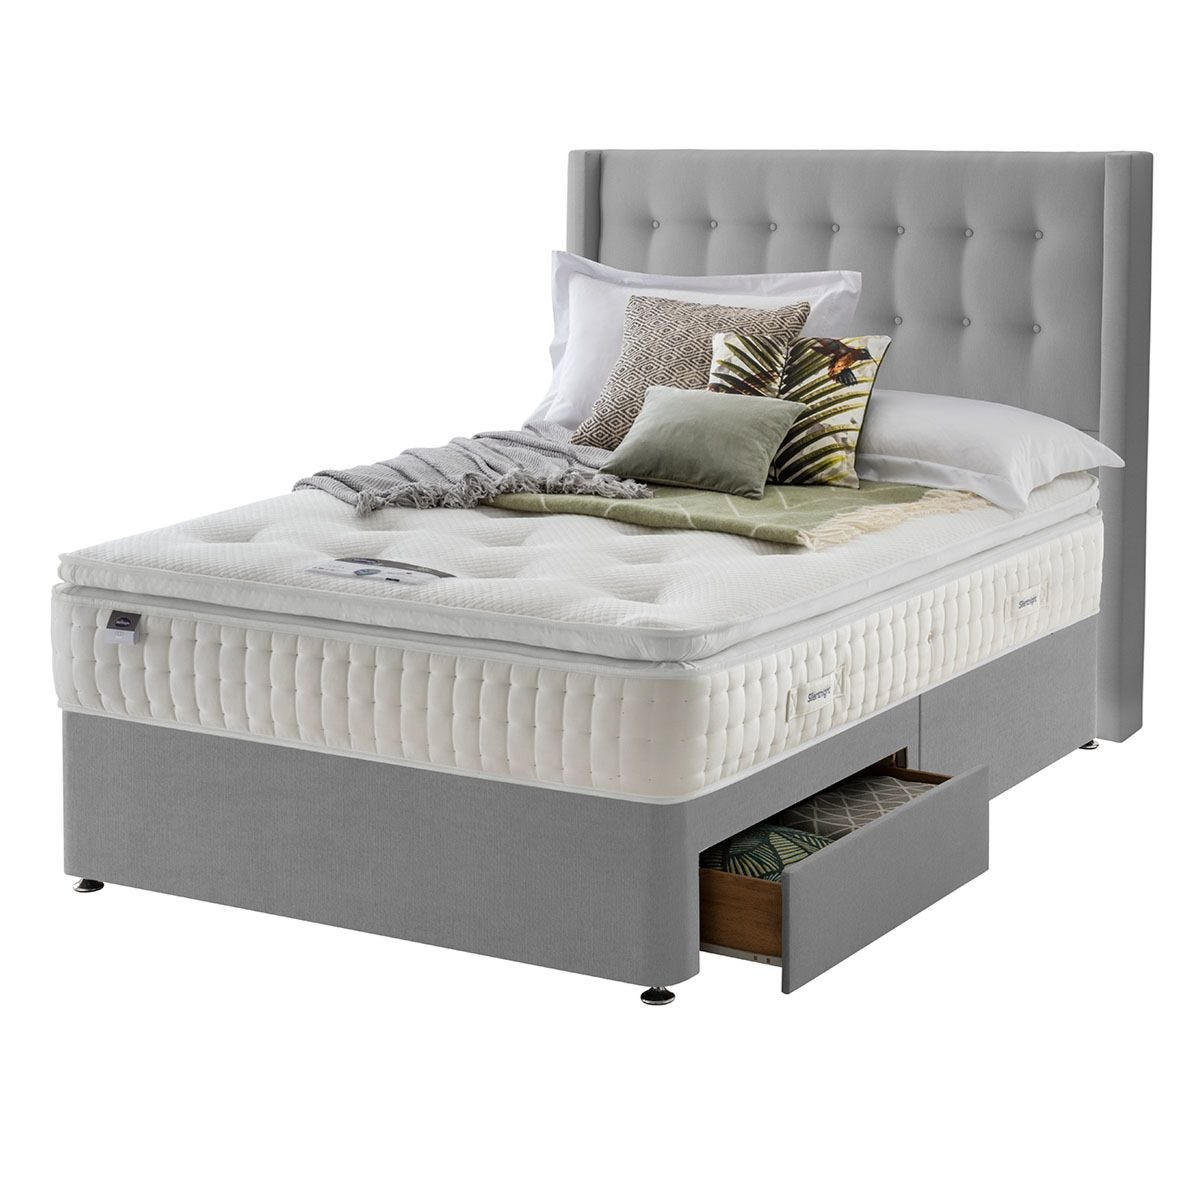 Silentnight Mirapocket Latex 1400 2-Drawer Divan Bed - Grey Double